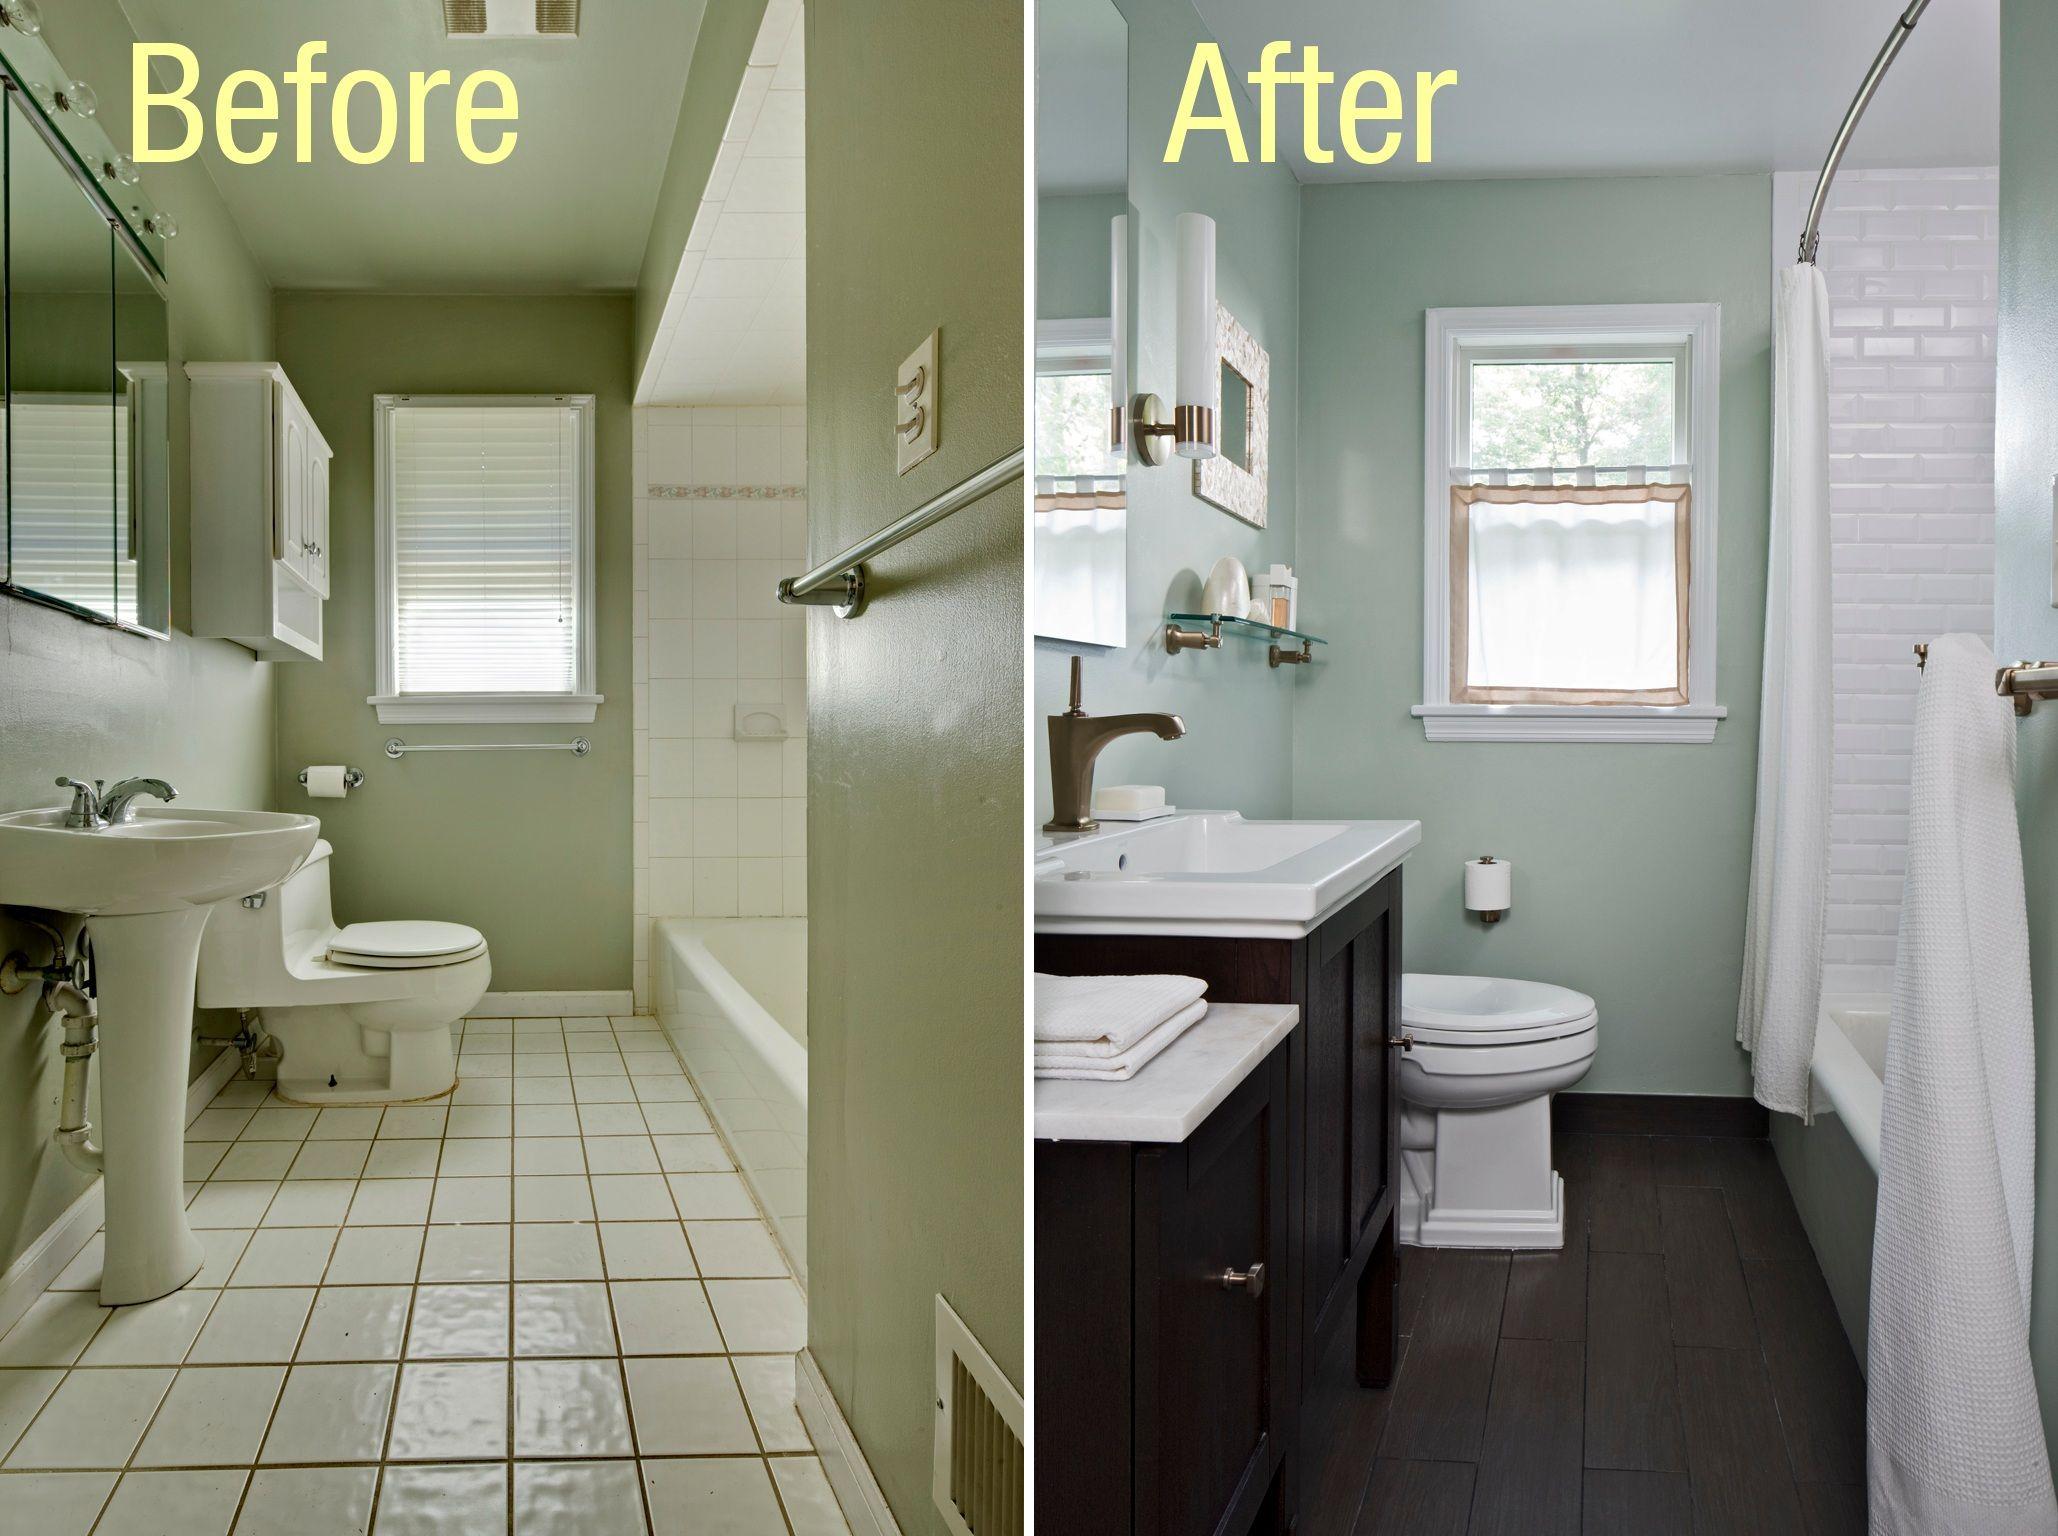 Inexpensive Bathroom Designs Google Search Small Bathroom Renovations Cheap Bathroom Remodel Small Bathroom Remodel